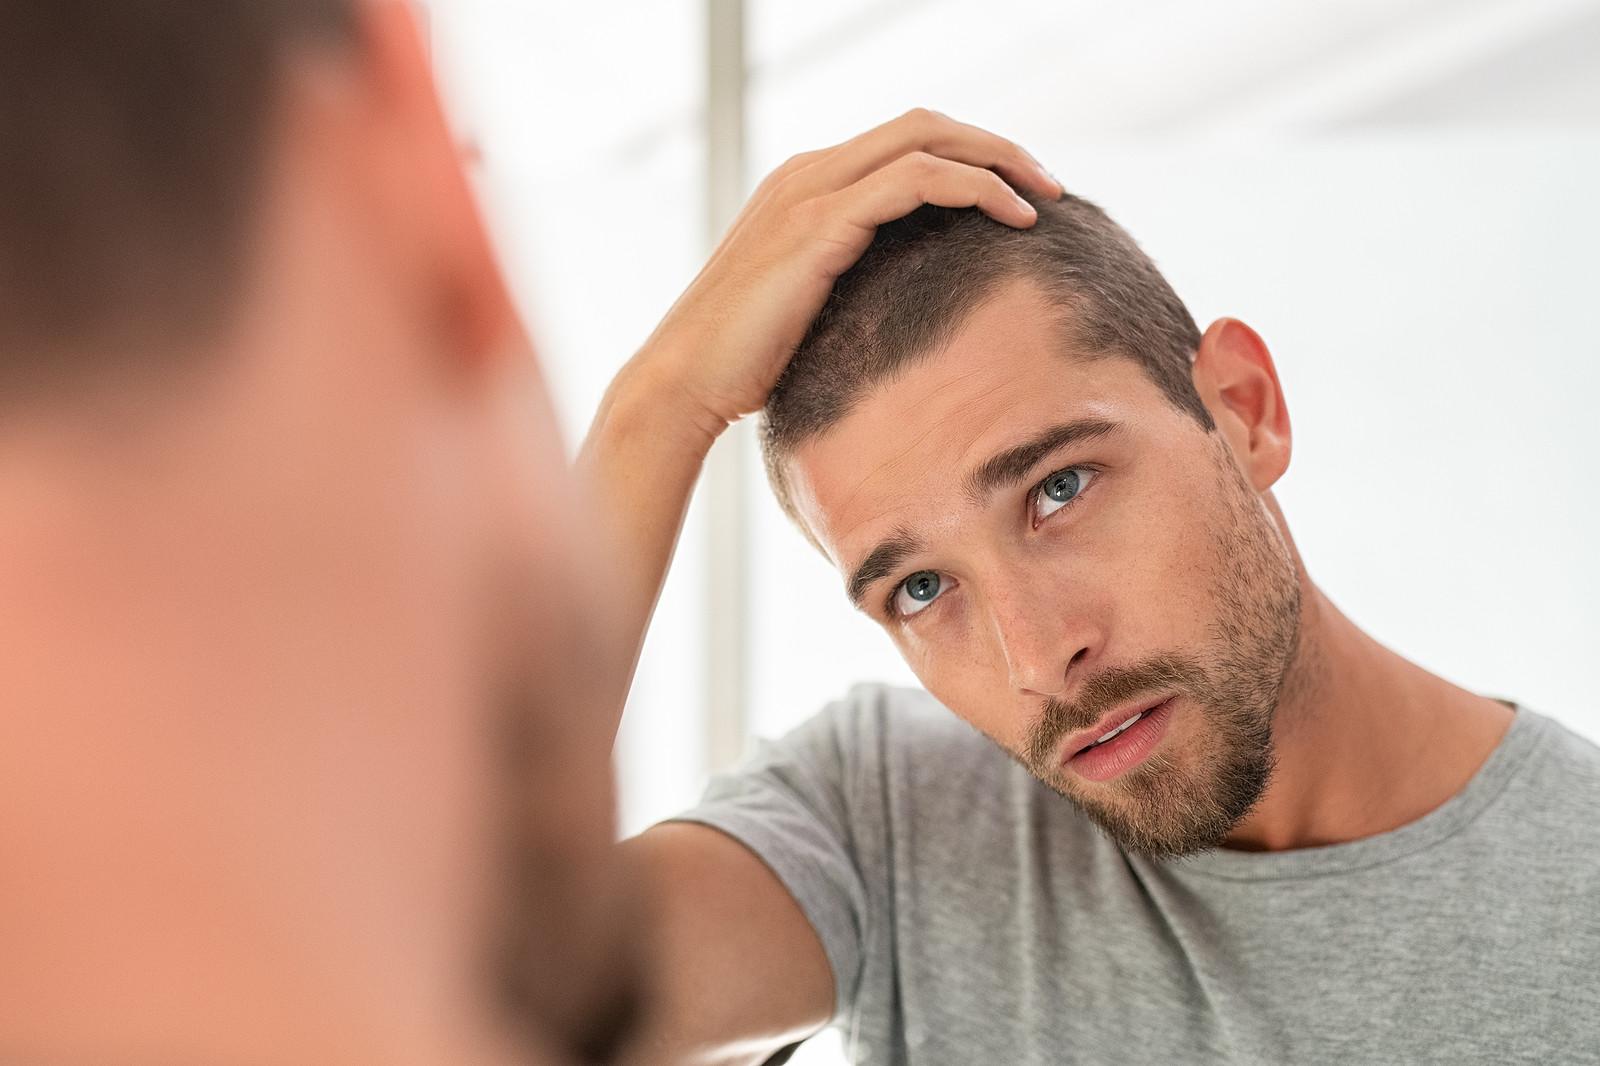 Haarausfall nach der Hauttransplantation entgegenwirken